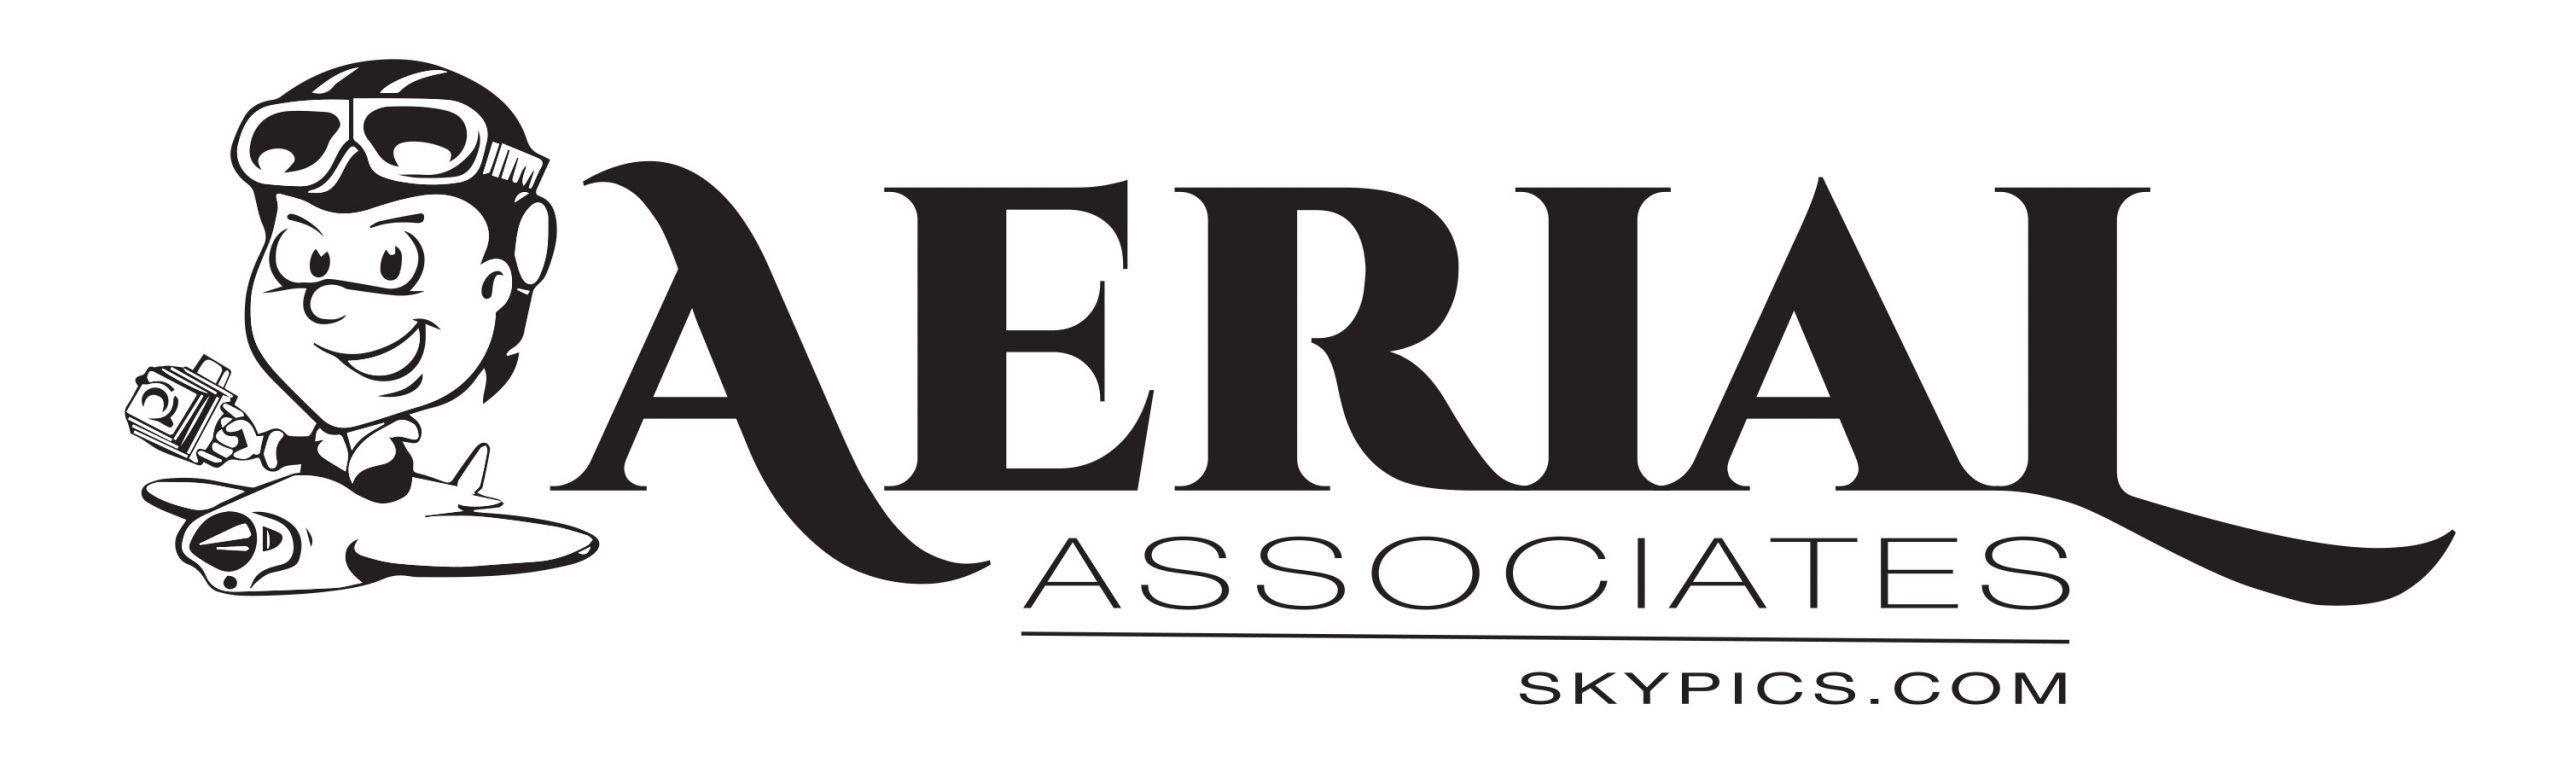 Aerial Associates